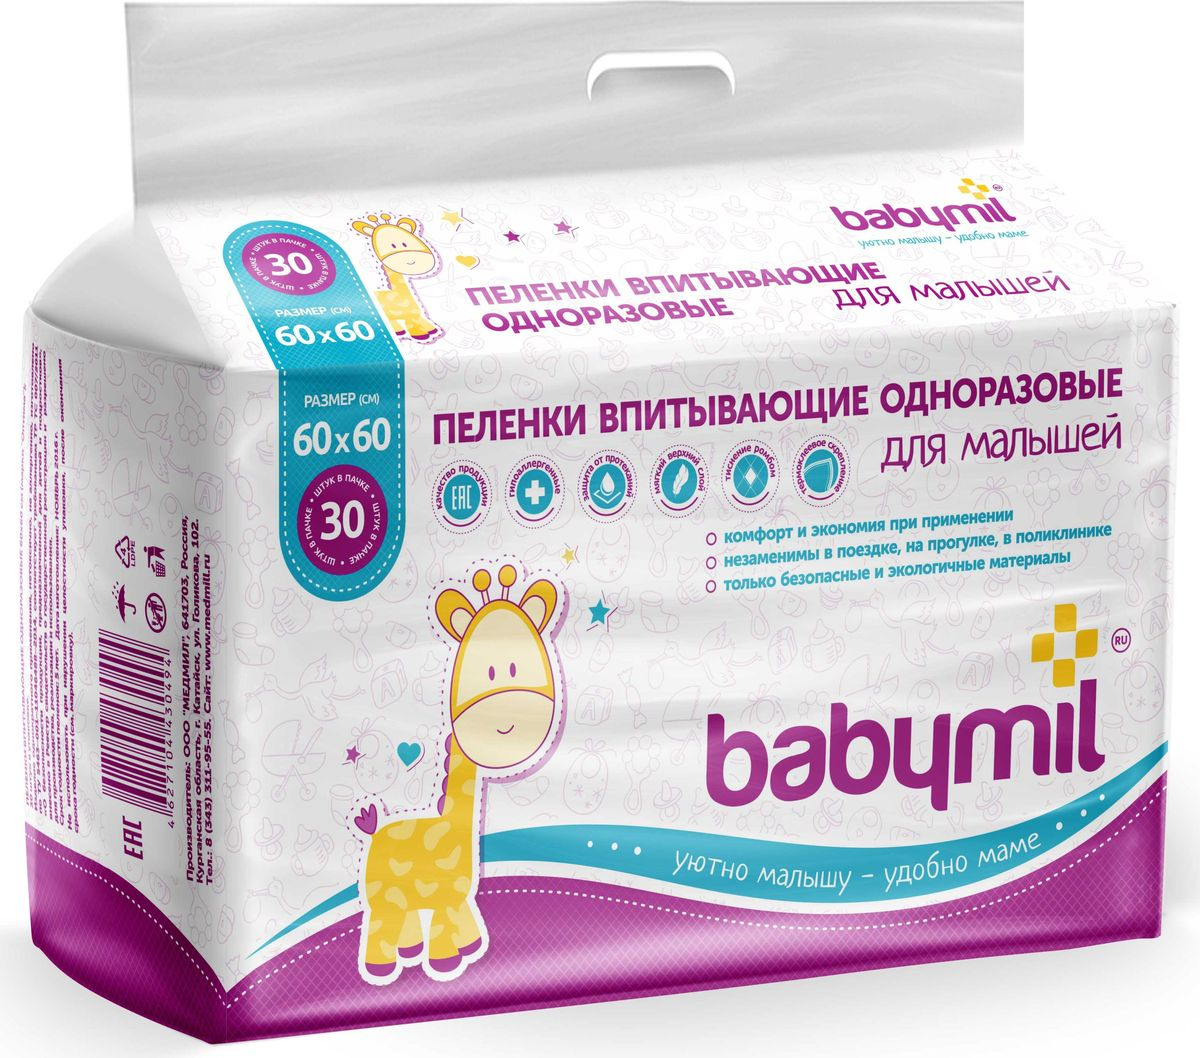 BabyMil Пеленки одноразовые впитывающие Оптима 60 х 60 см 30 шт